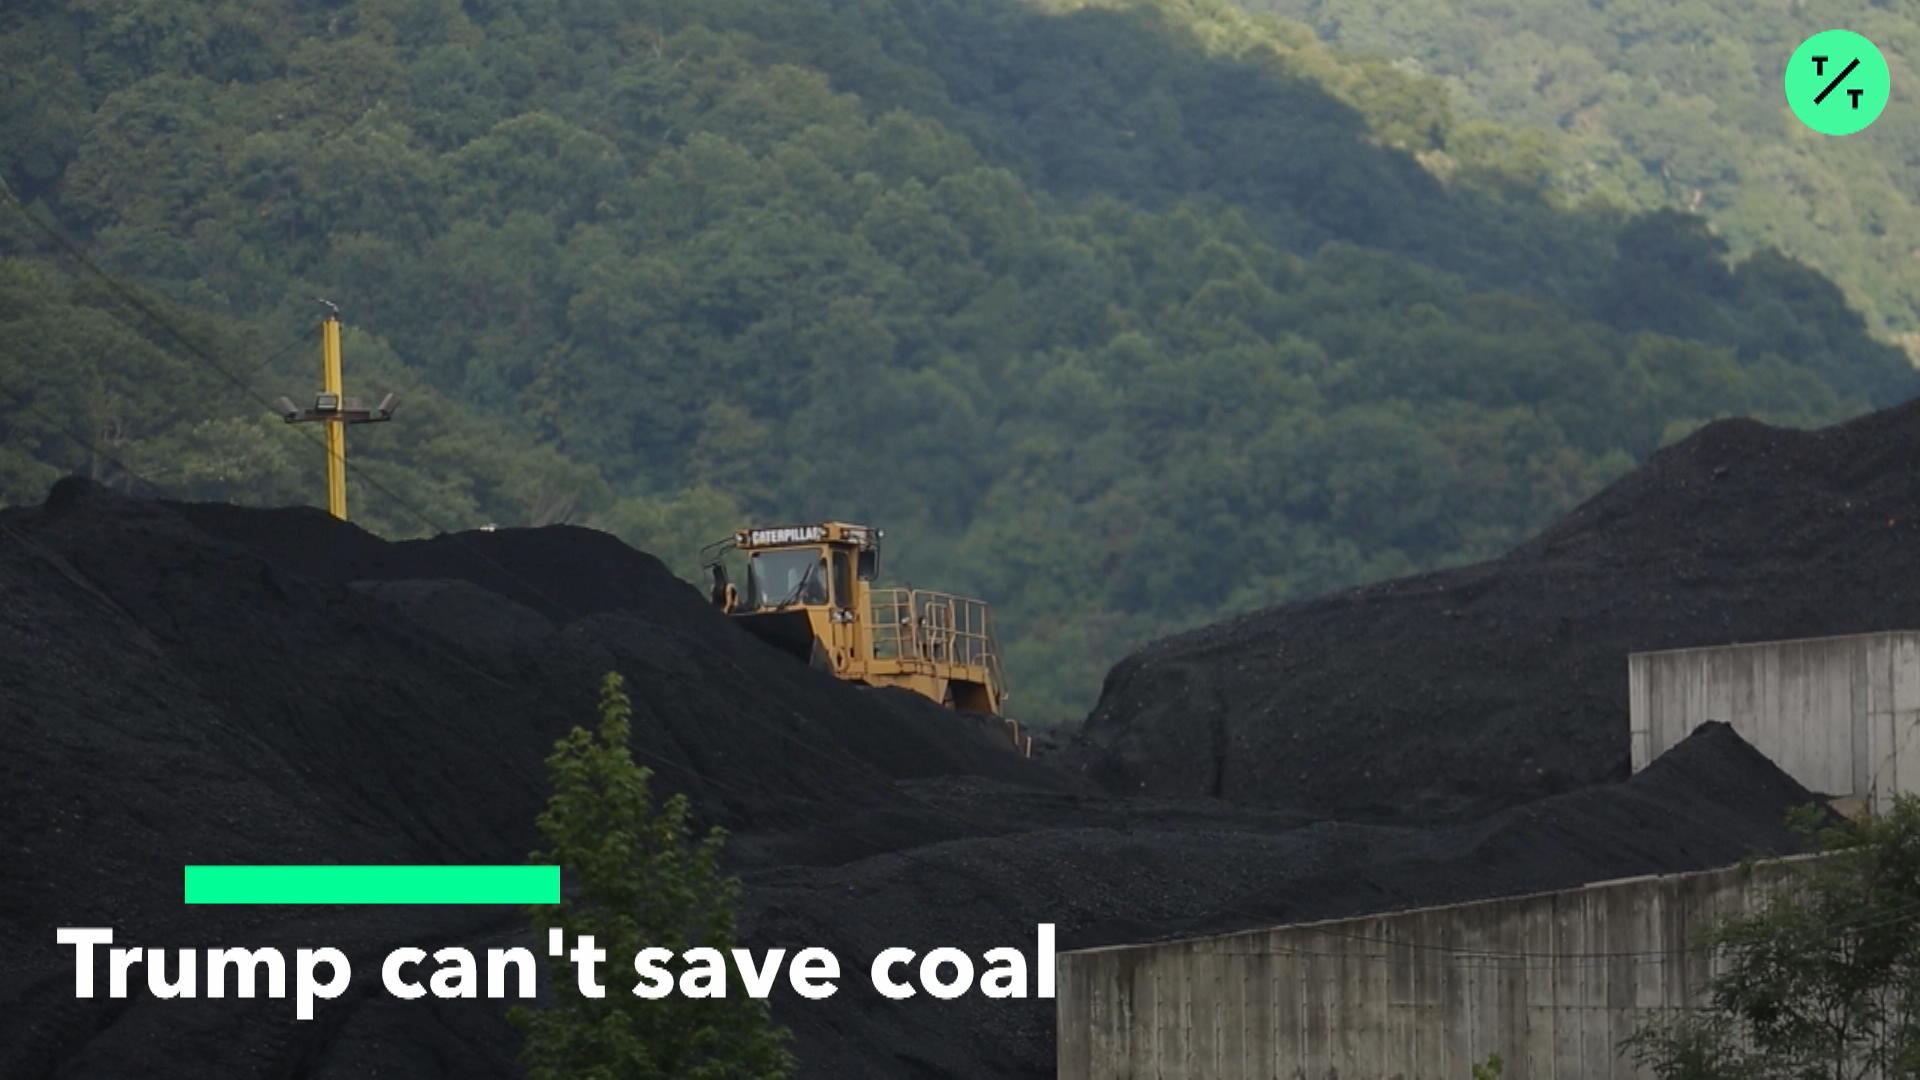 Trump Can't Save Coal